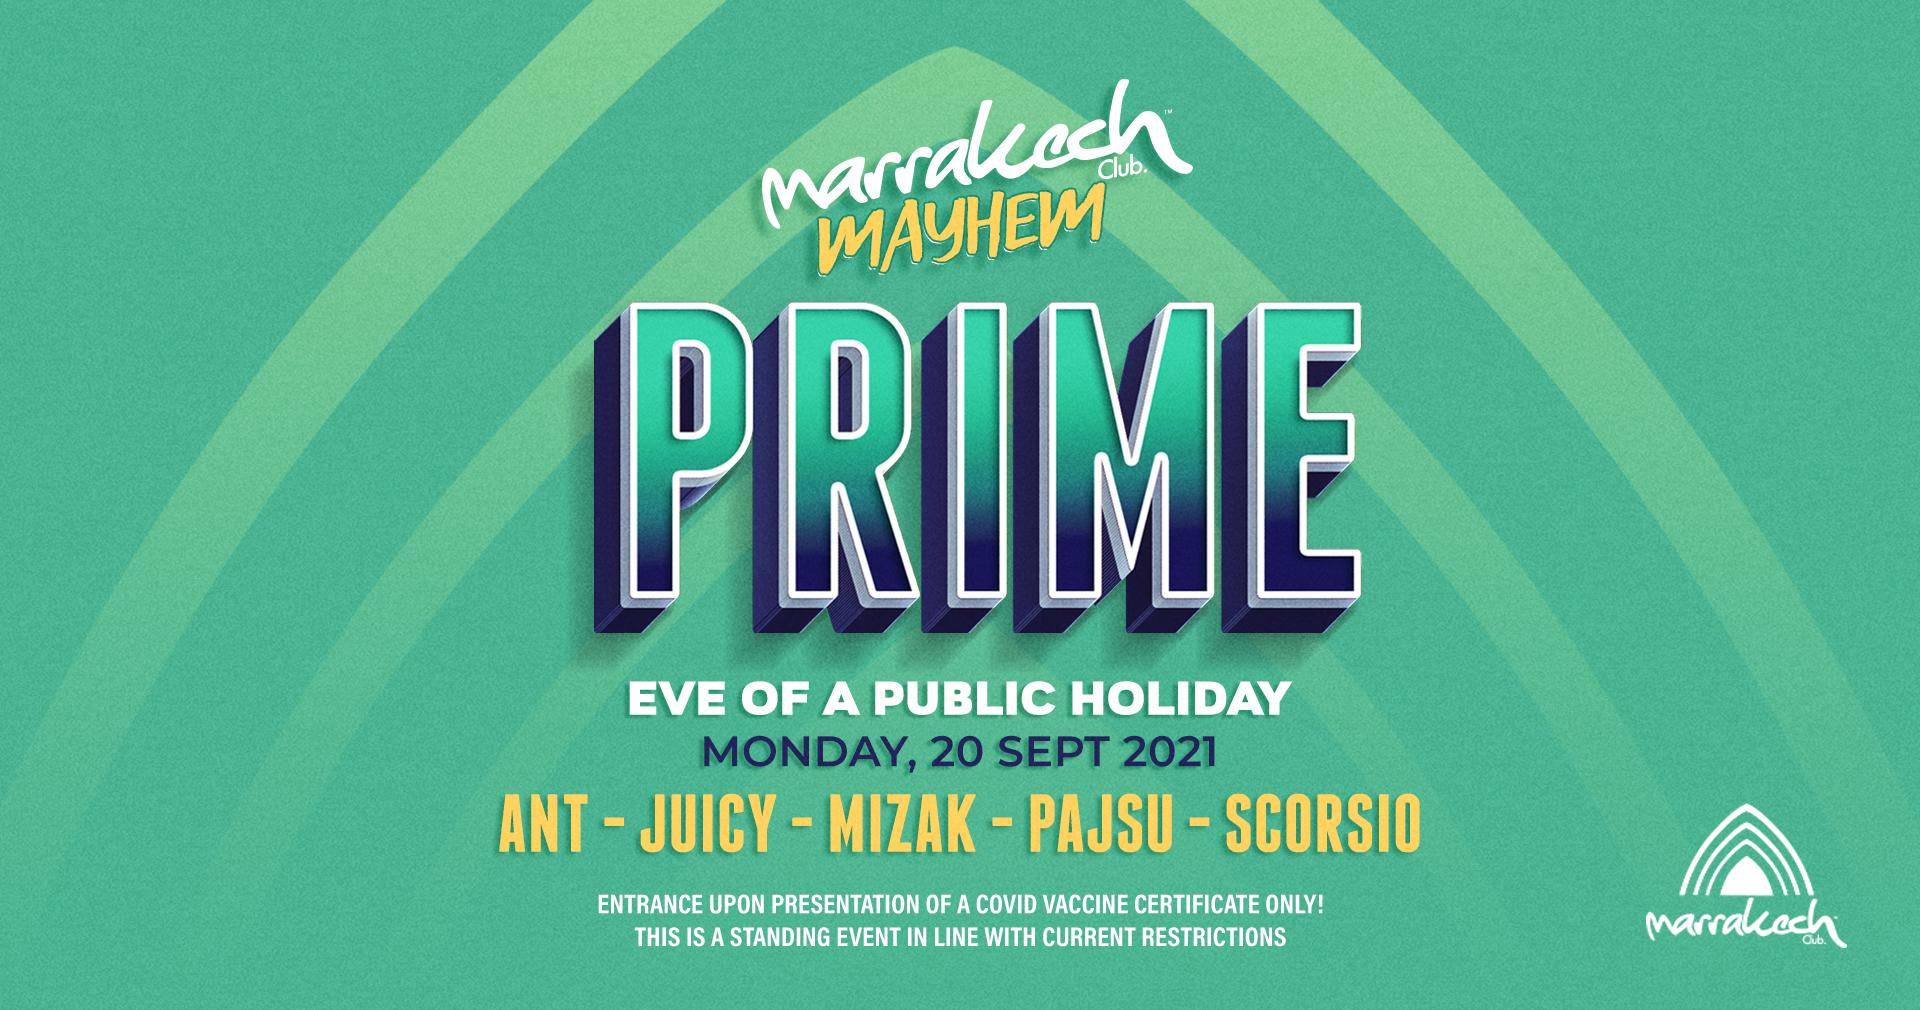 Prime   Marrakech Mayhem! (Eve of PH)